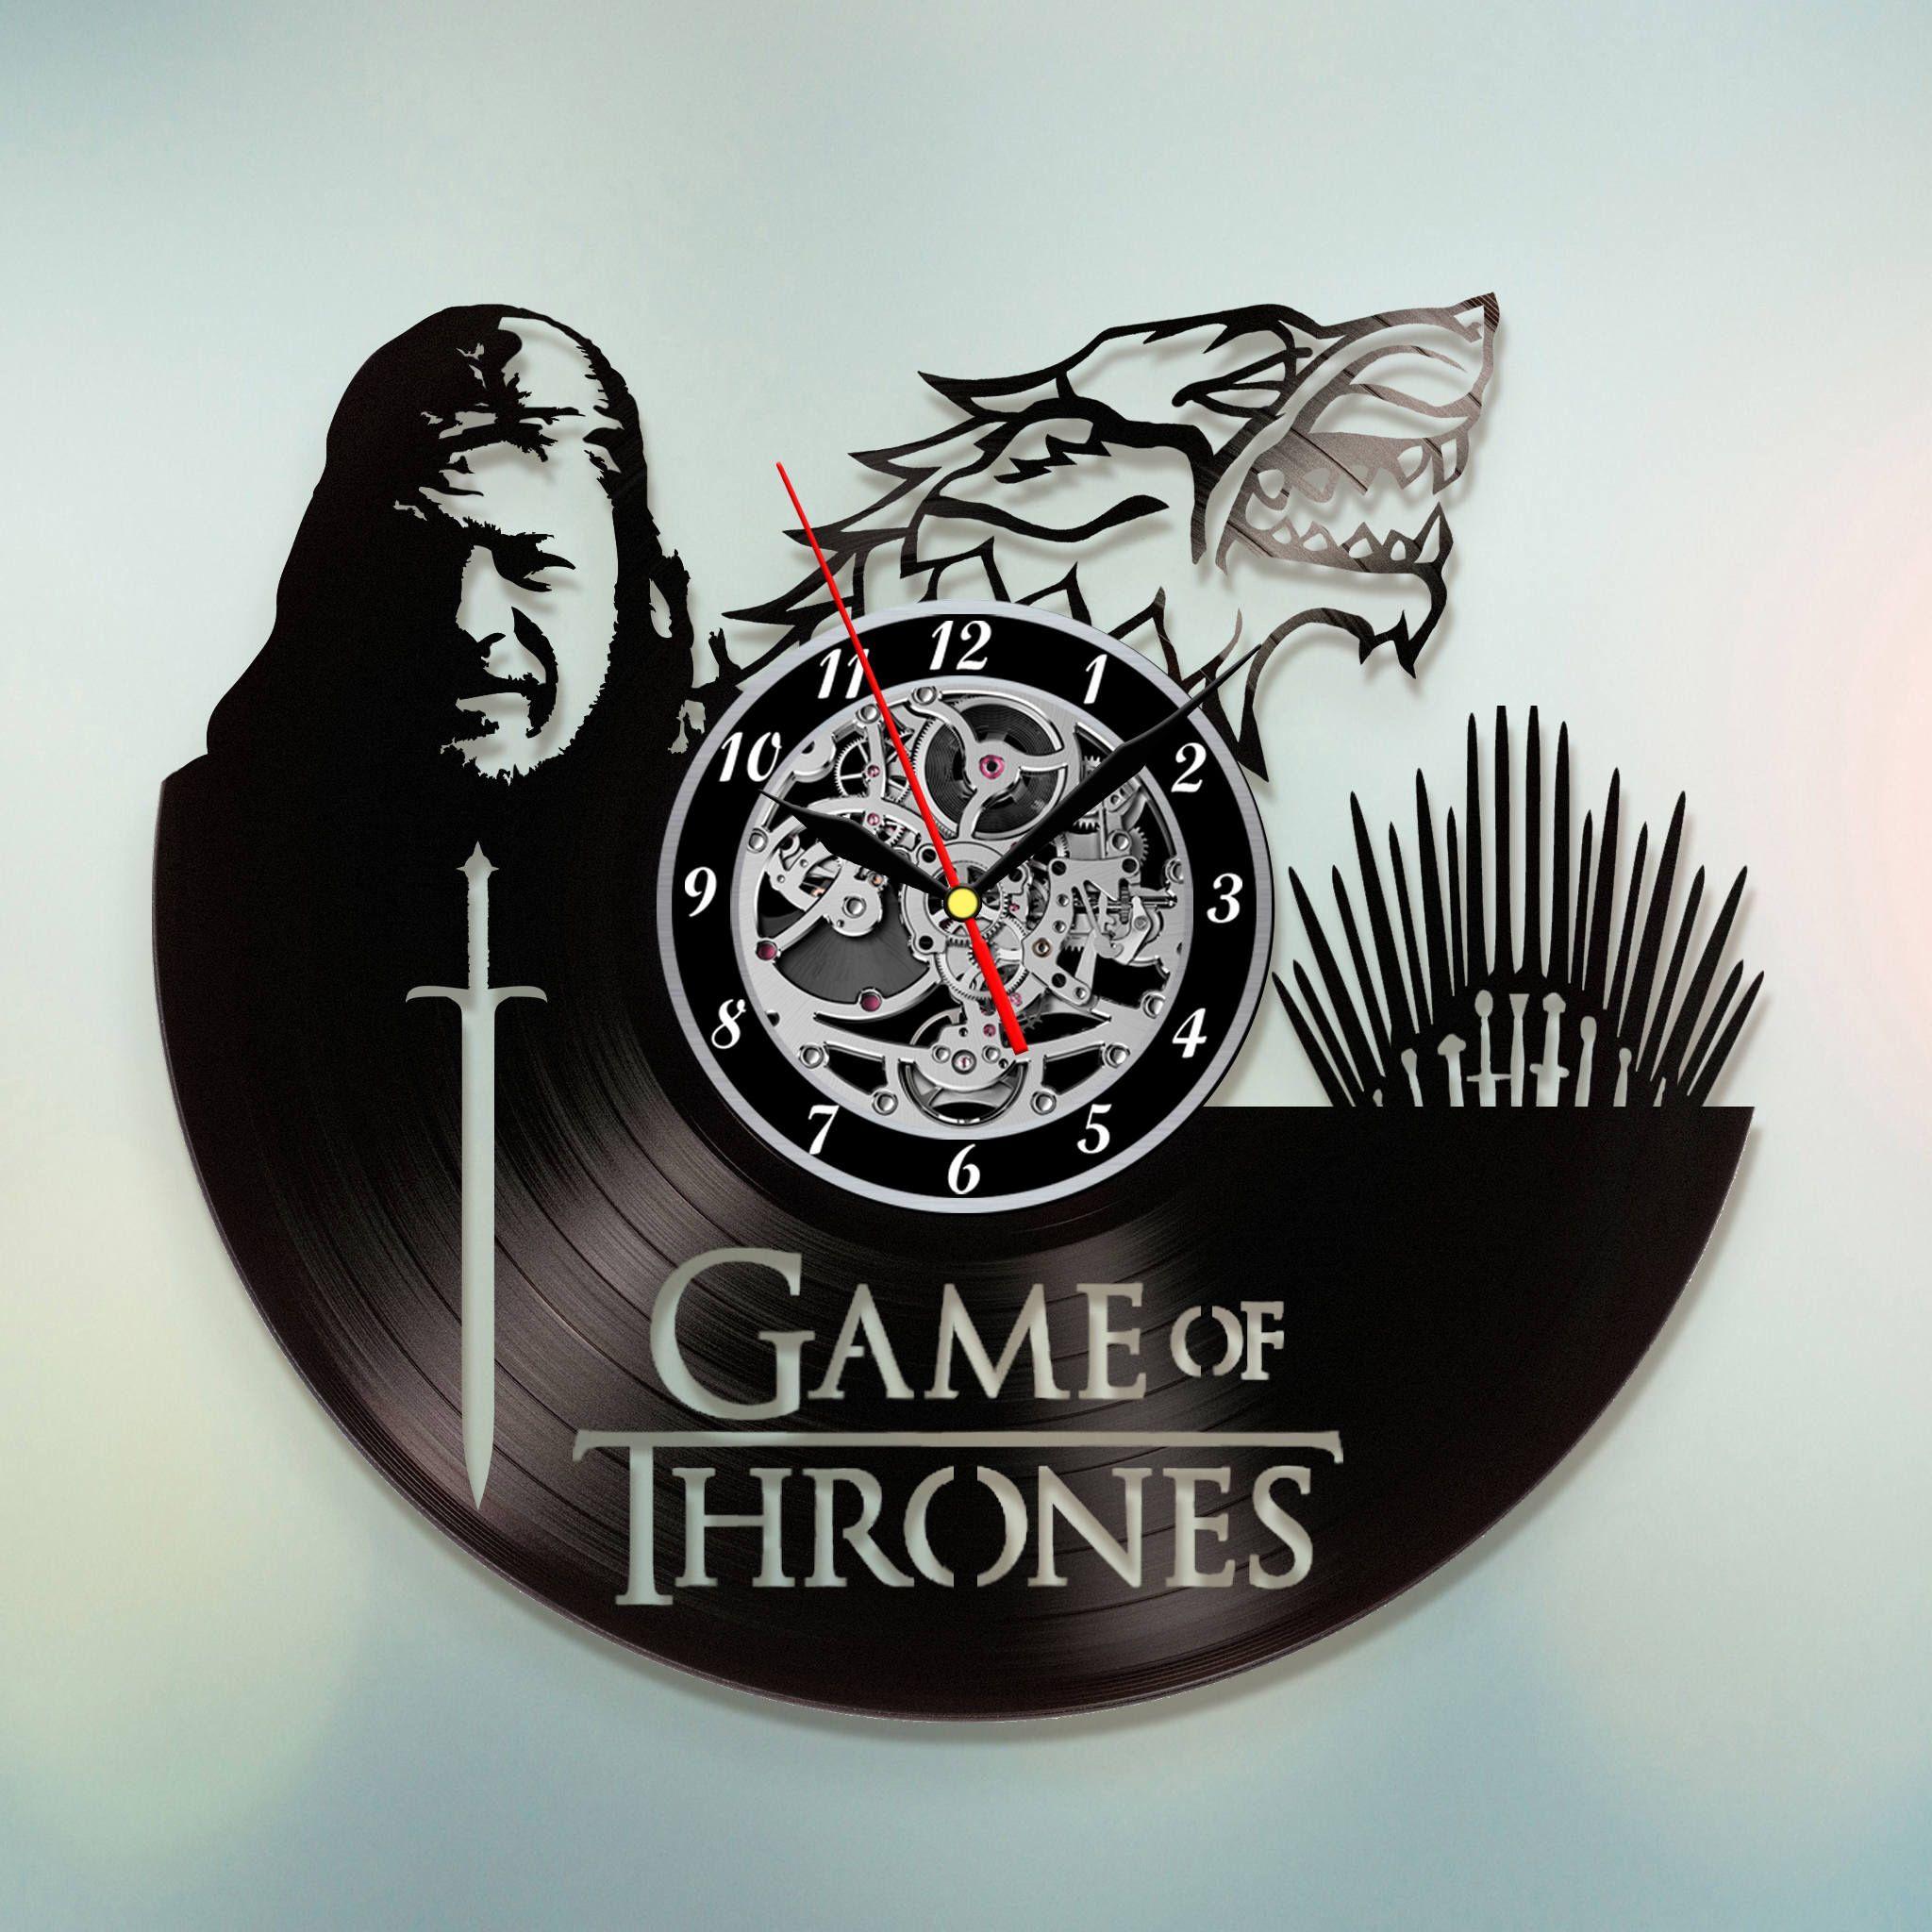 Game of Thrones Vinyl record clock Home design home decor